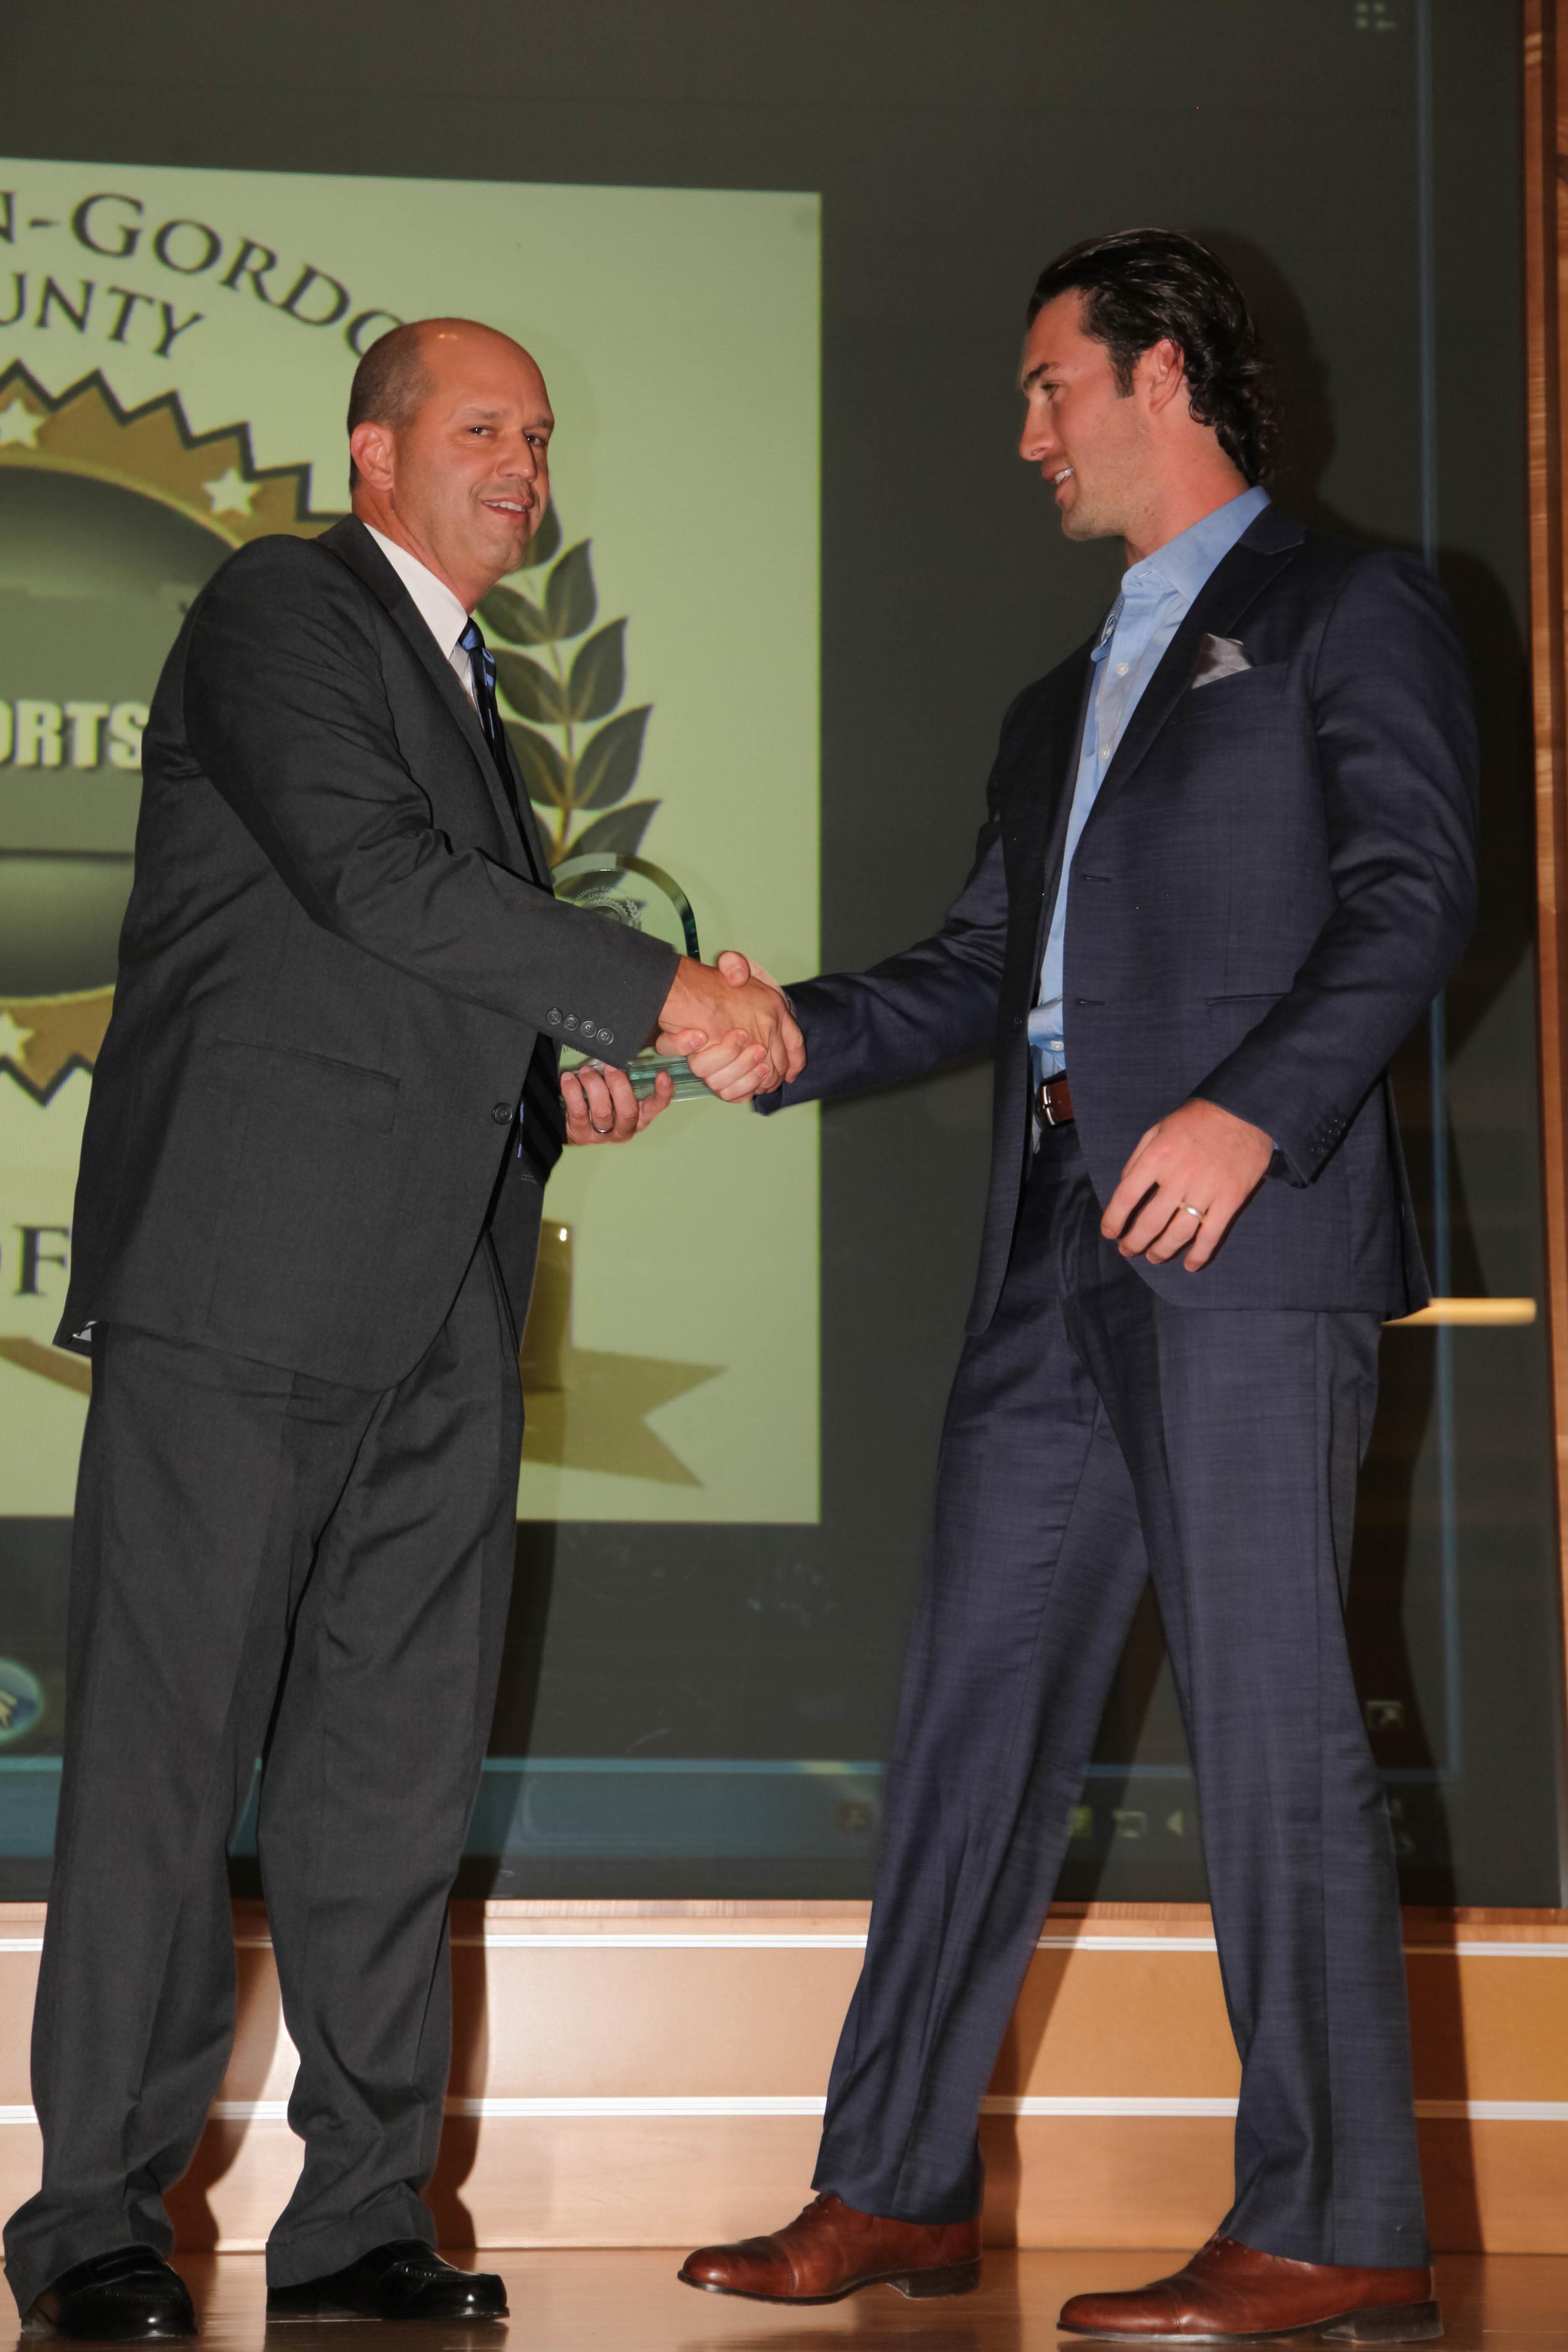 Calhoun-Gordon-County-Sports-Hall-of-Fame-2015-053.jpg